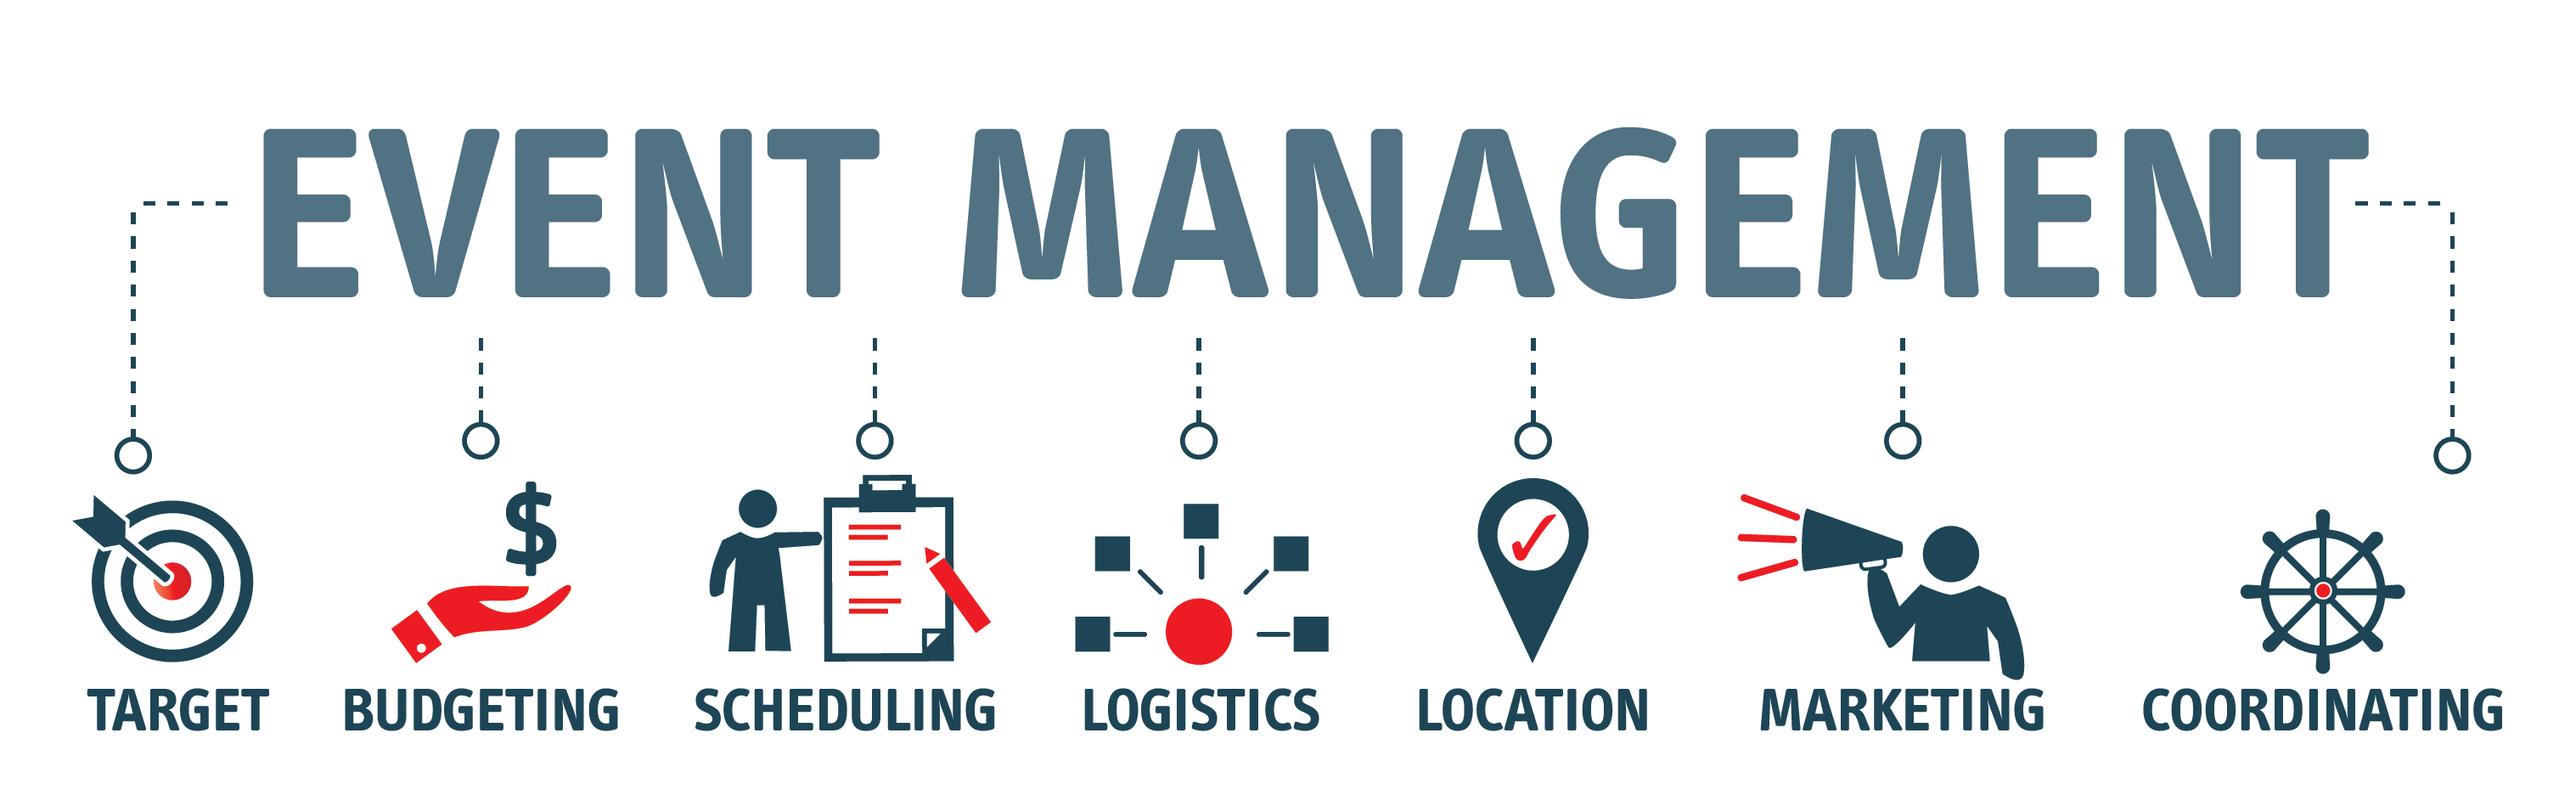 Event Management Aspects